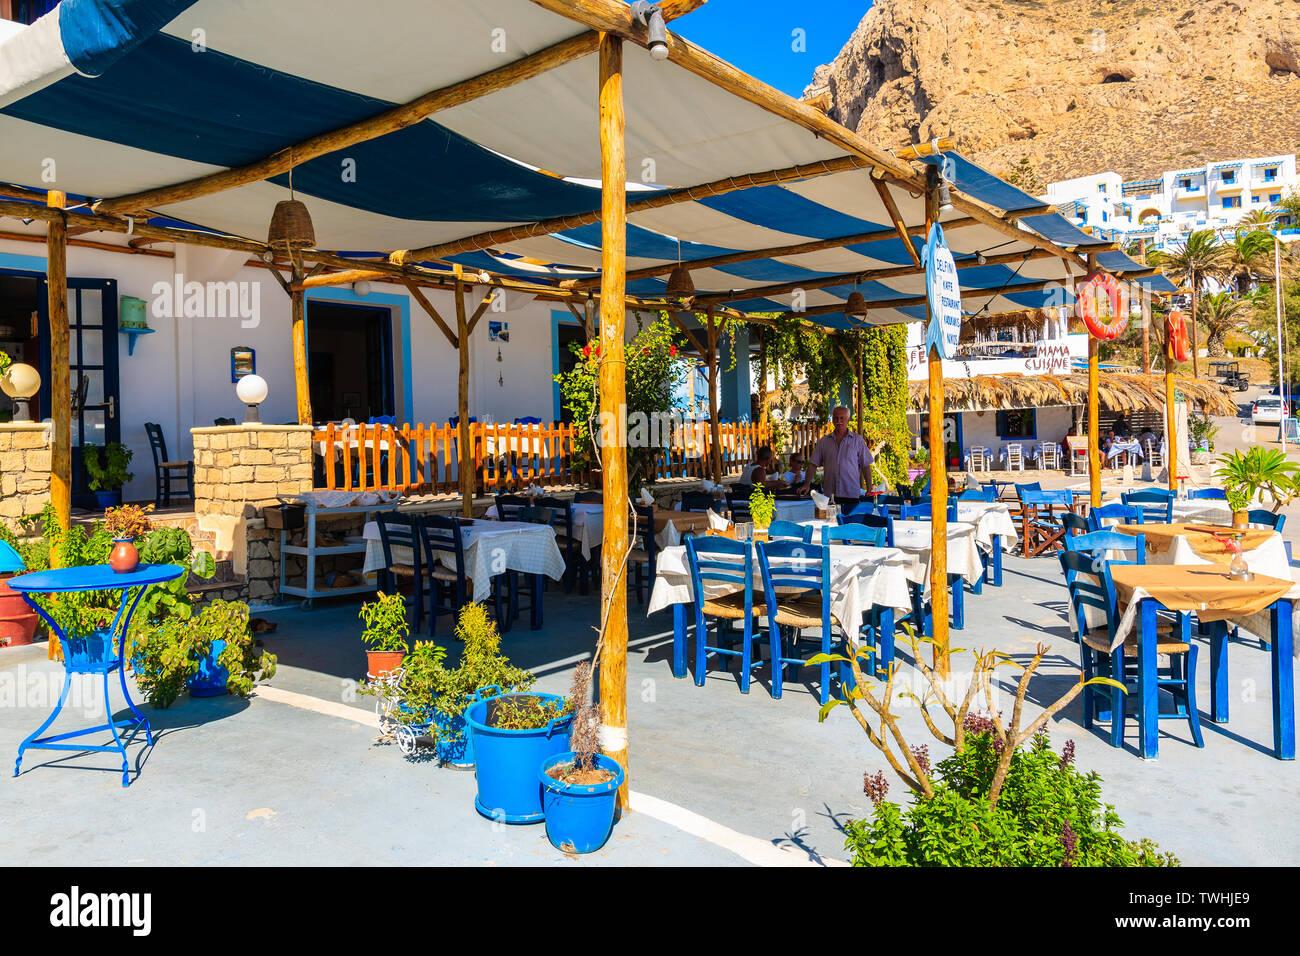 FINIKI PORT, KARPATHOS ISLAND - SEP 25, 2018: View of taverna restaurant in small fishing village on coast of Karpathos island, Greece. Stock Photo